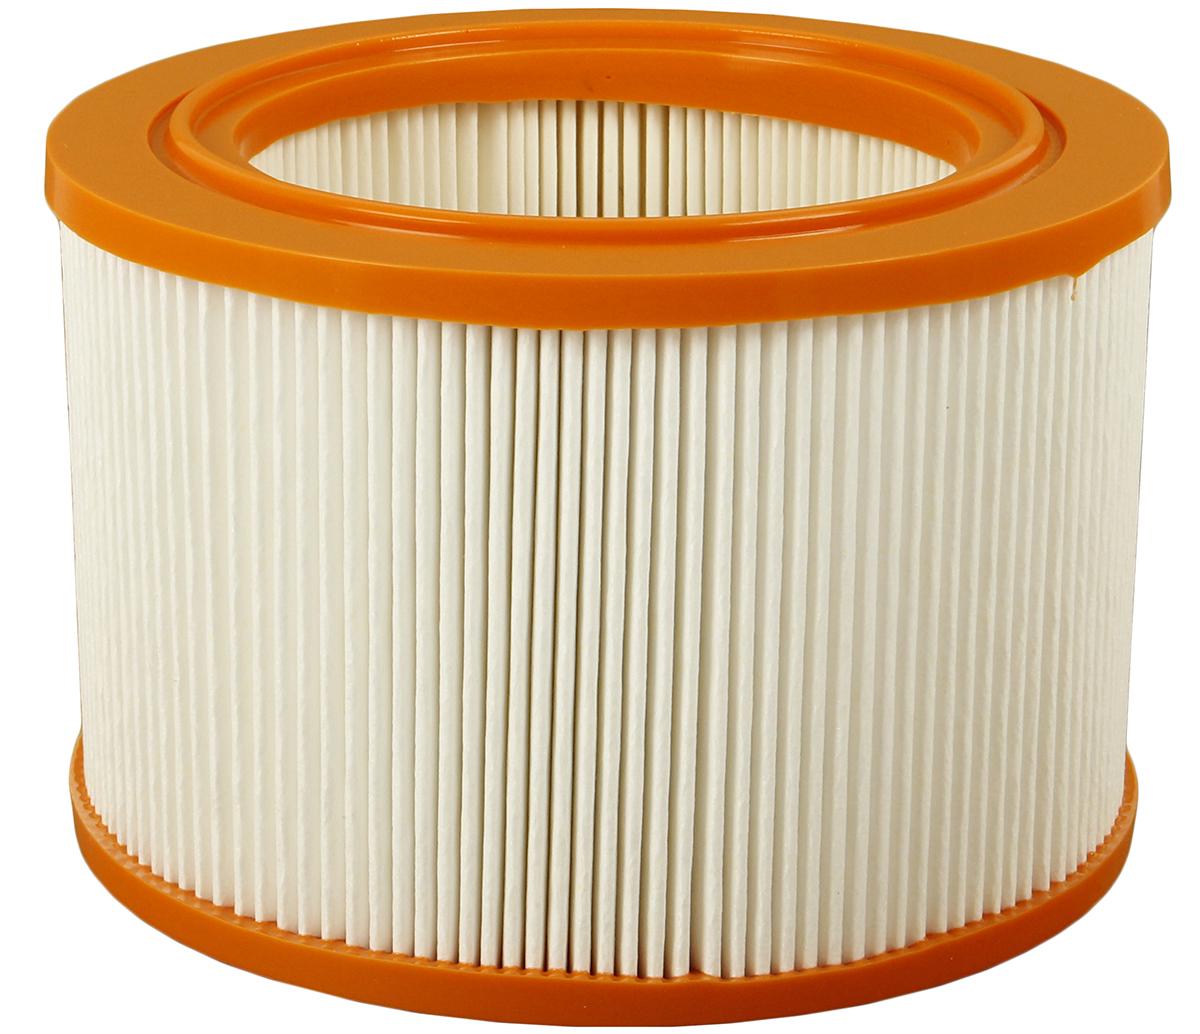 STAUBKLASSE H Filter Alto Attix 360-2H Lamellenfilter für Nilfisk 50-0H PC